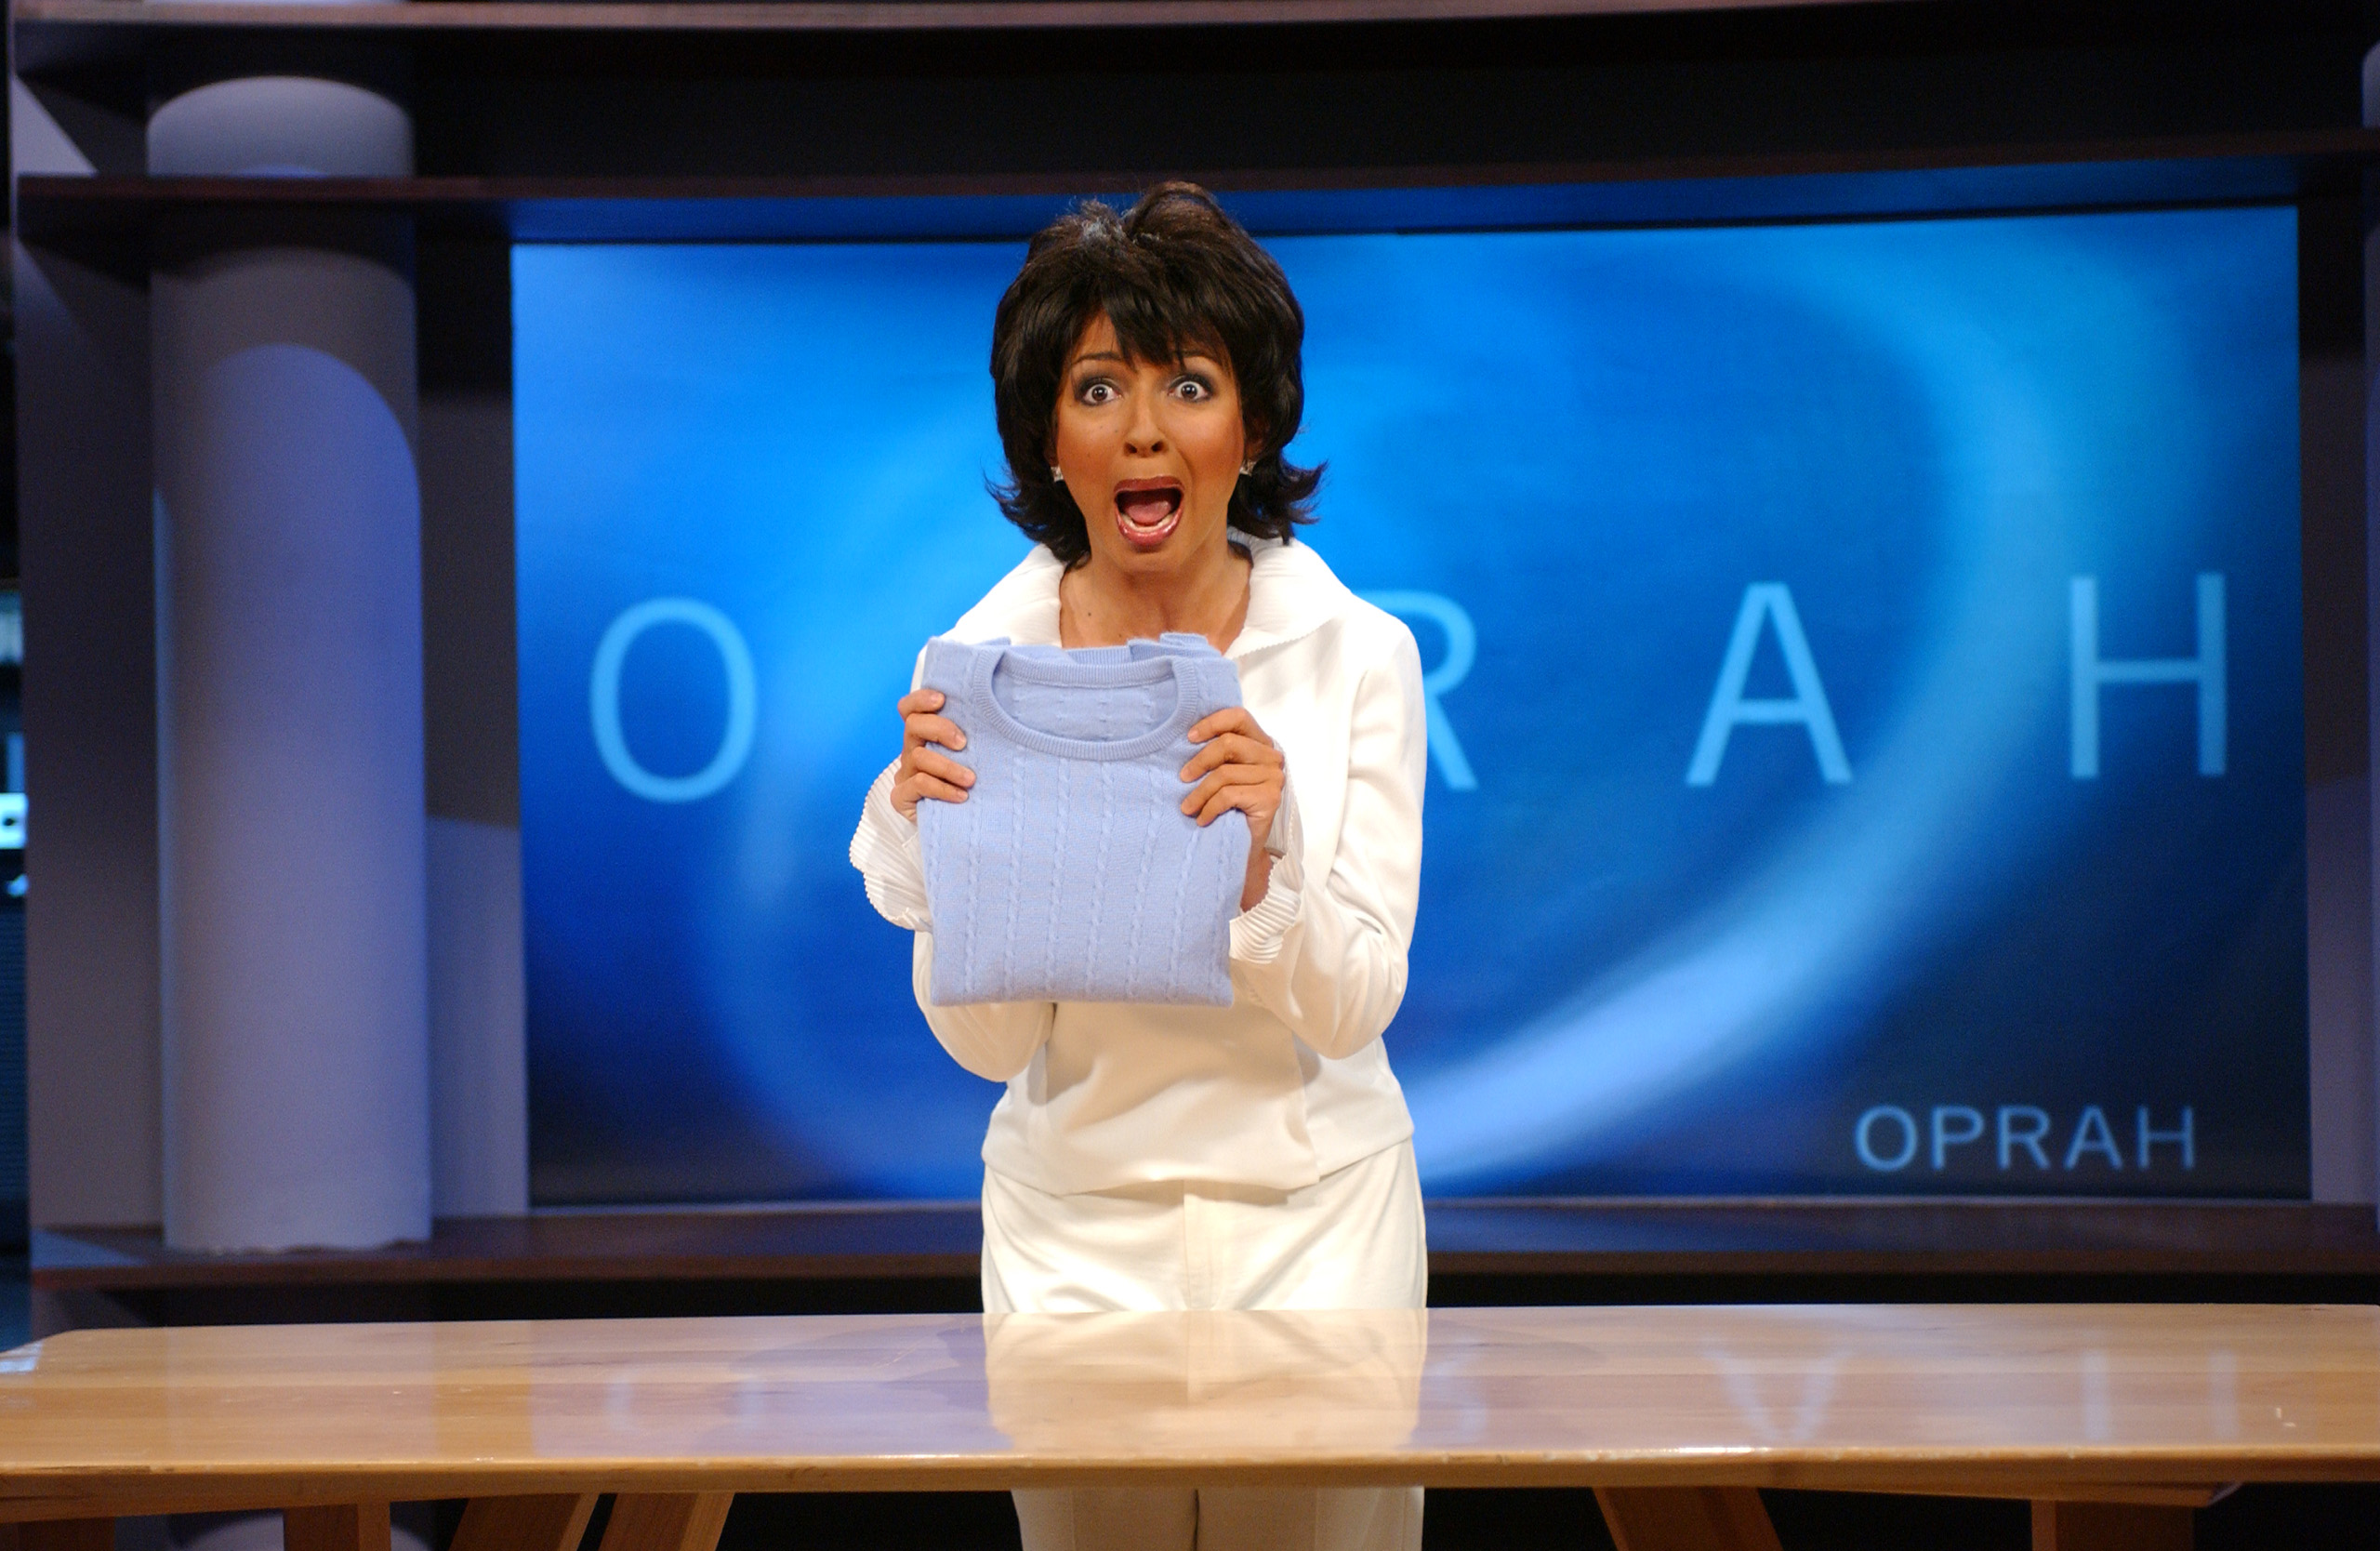 Maya Rudolph as Oprah Winfrey during the  Oprah  skit on Saturday Night Live on February 7, 2004.